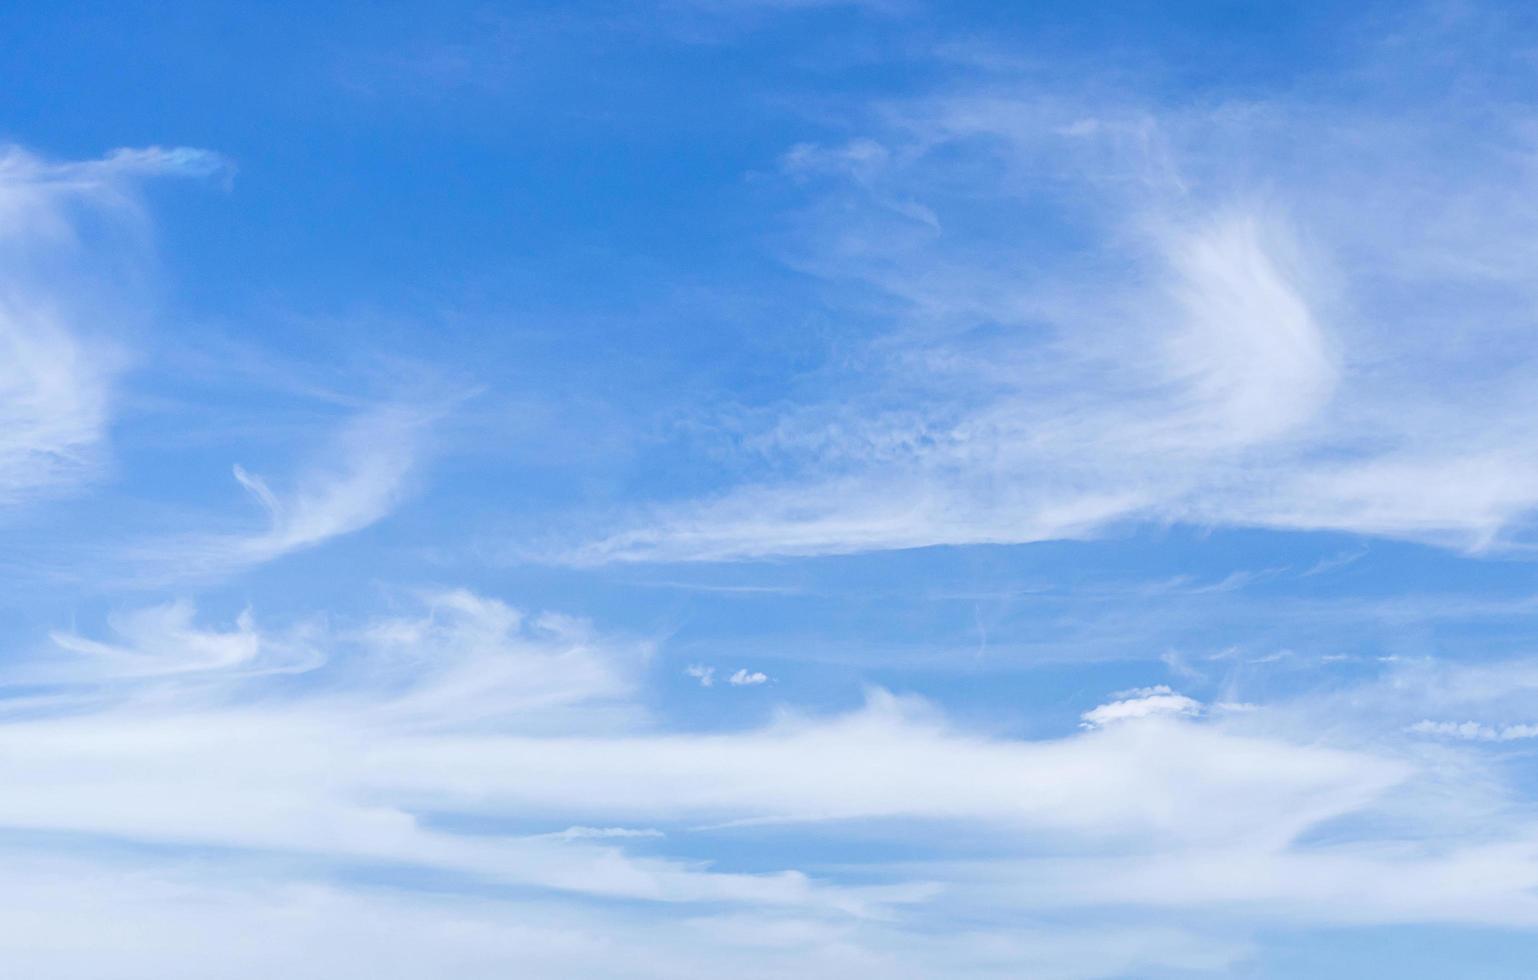 cielo nuvoloso blu foto